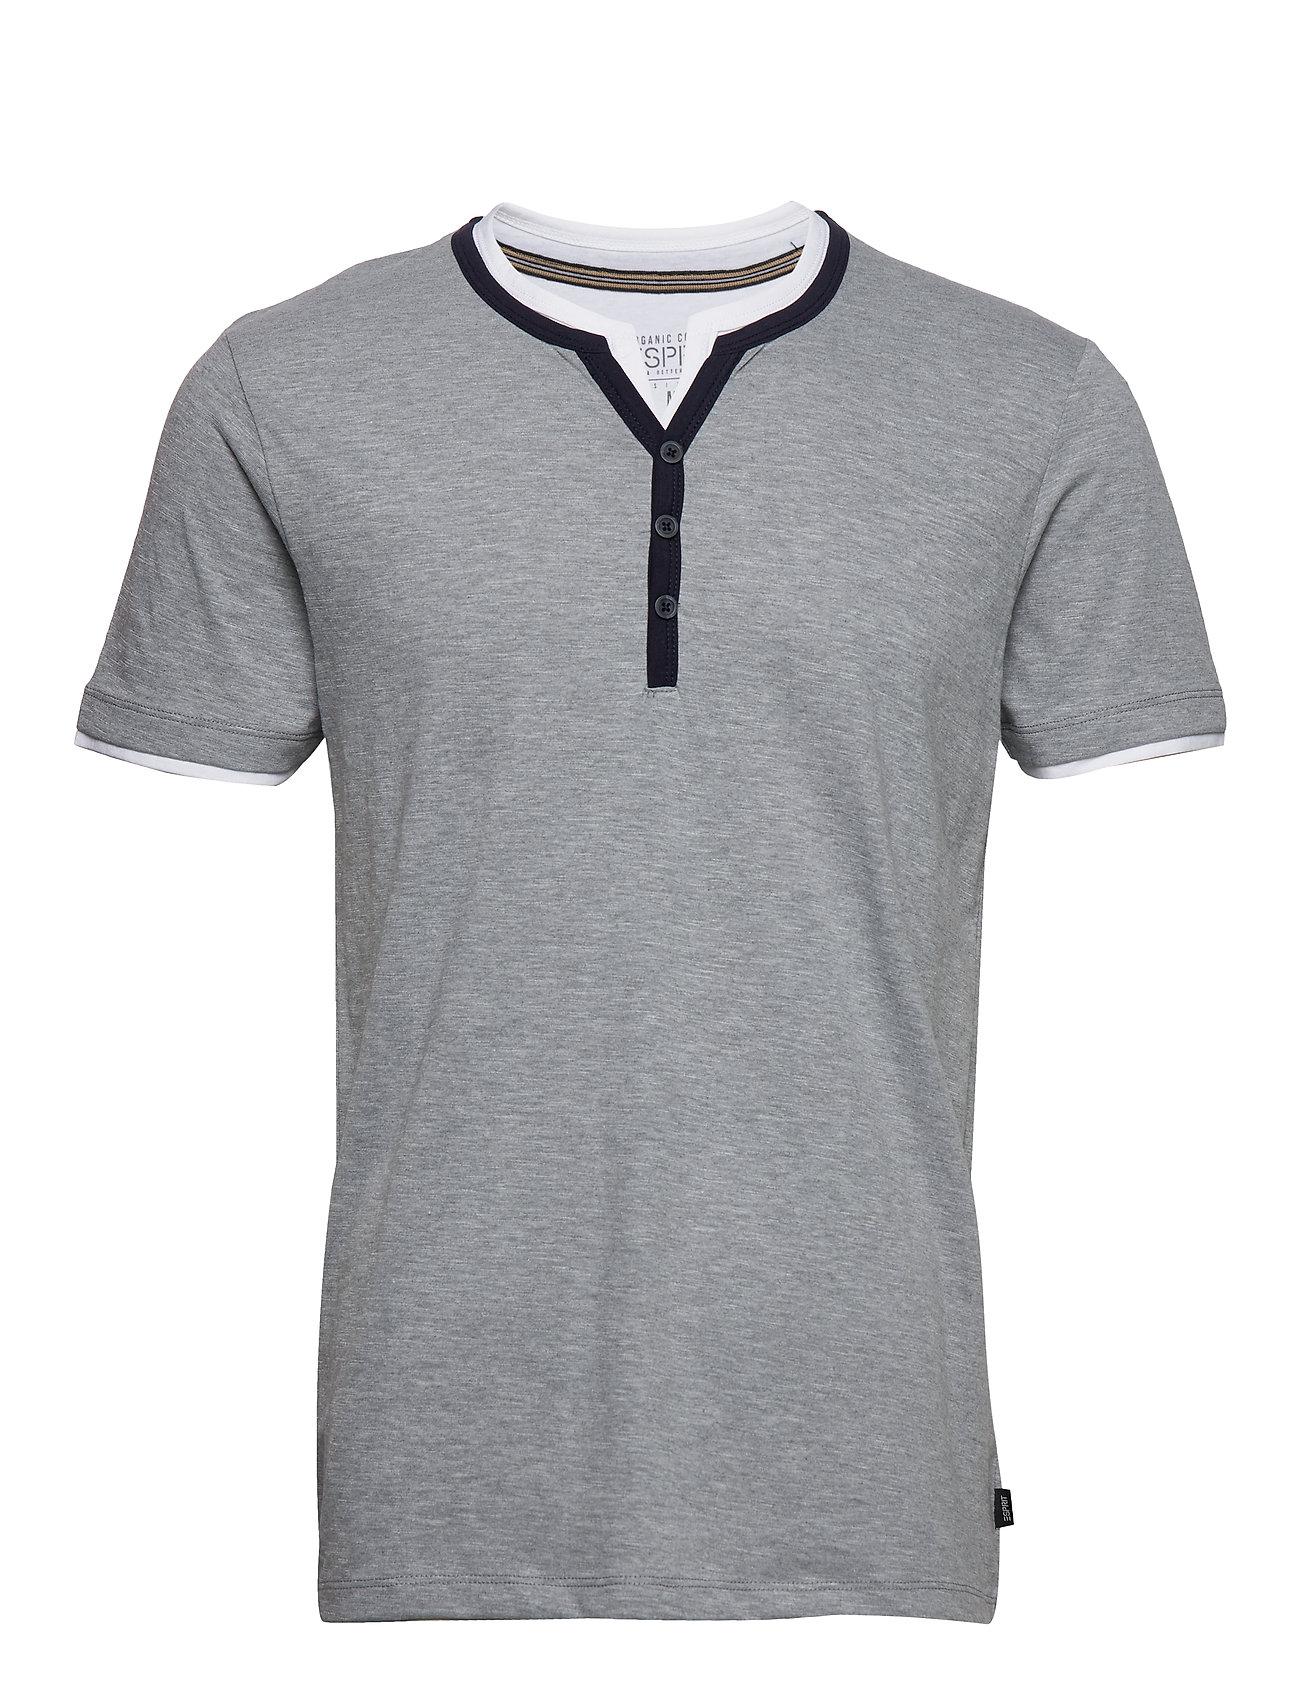 Esprit Casual T-Shirts - MEDIUM GREY 5